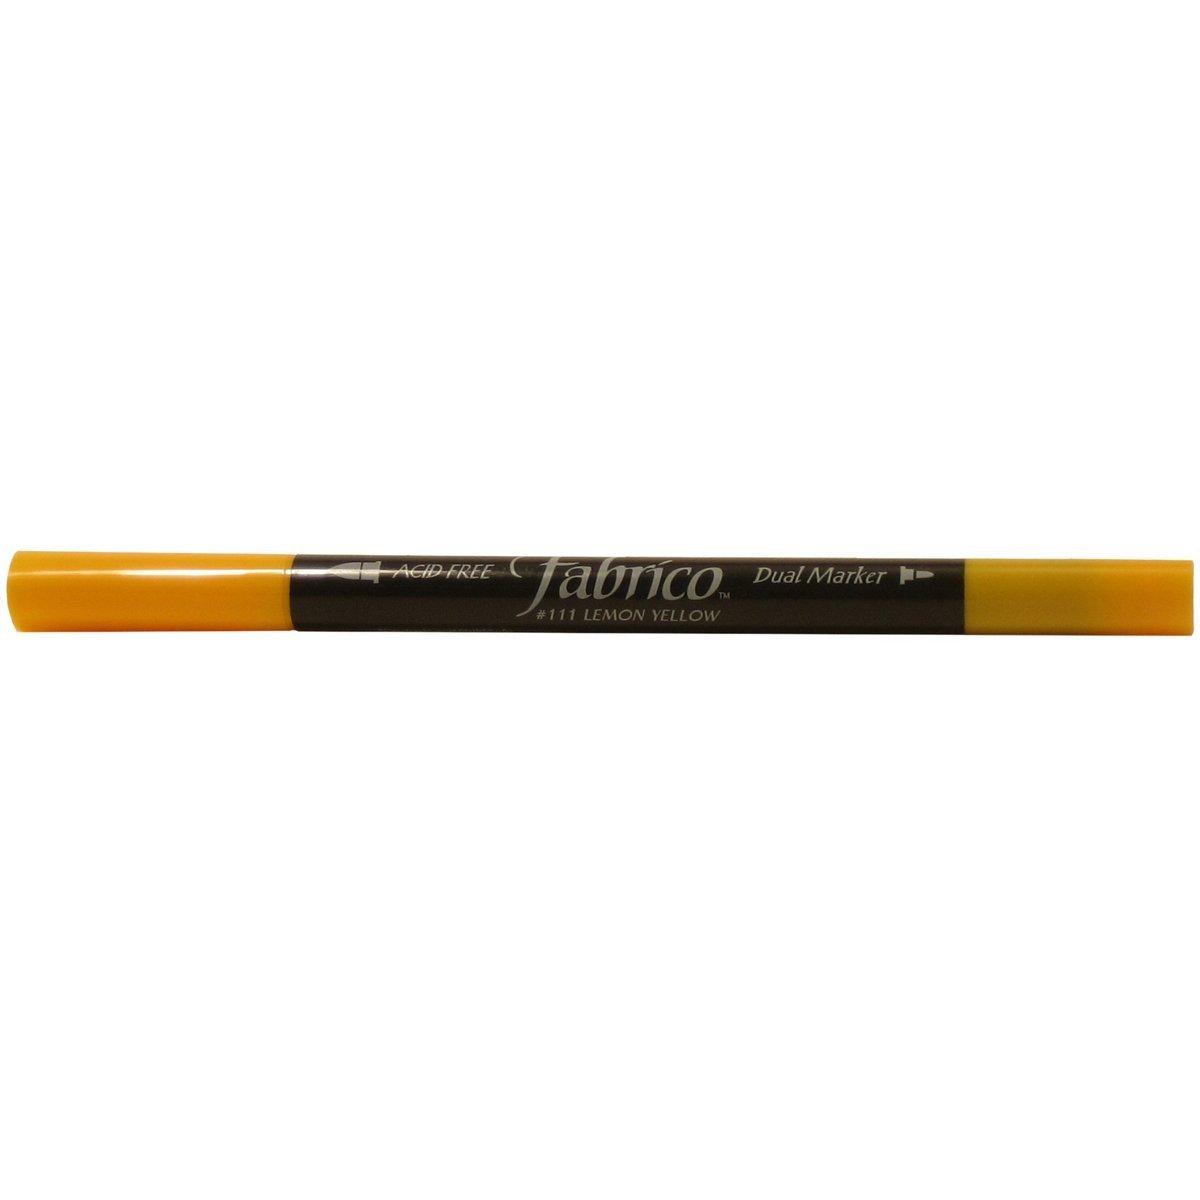 111 Lemon Yellow - Fabrico Dual Tip Marker